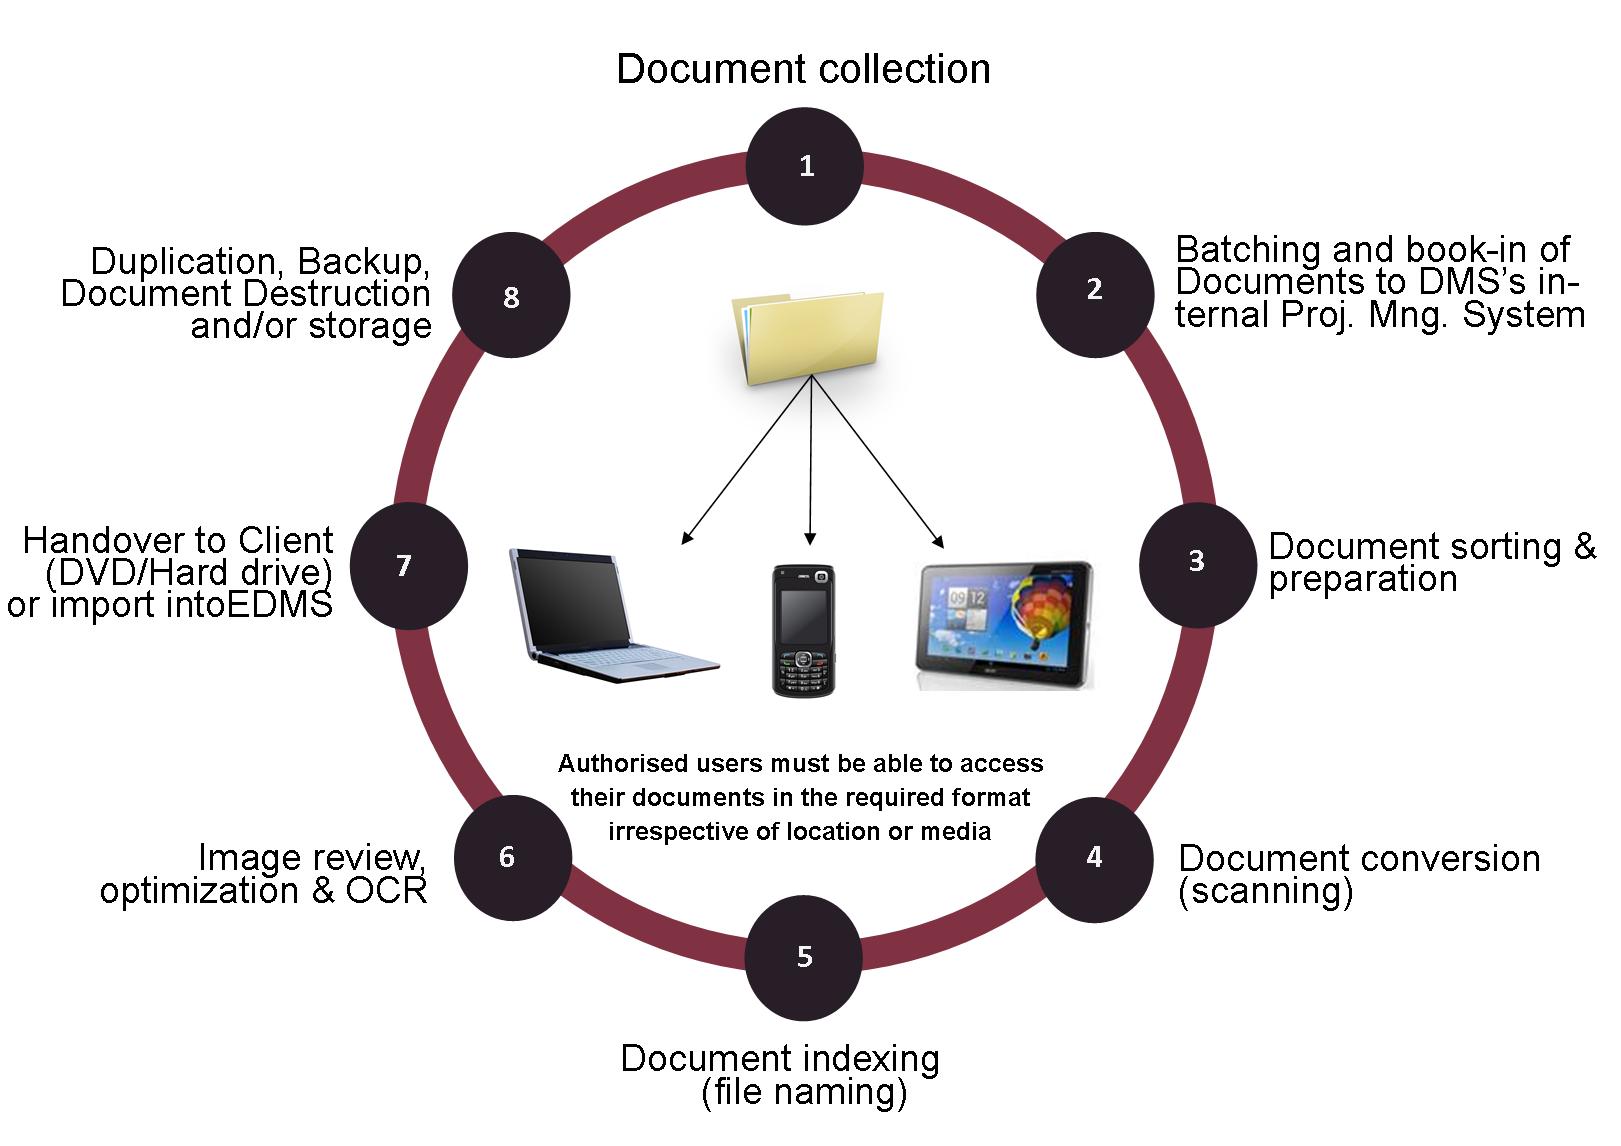 Document Imaging Scanning - Document management process